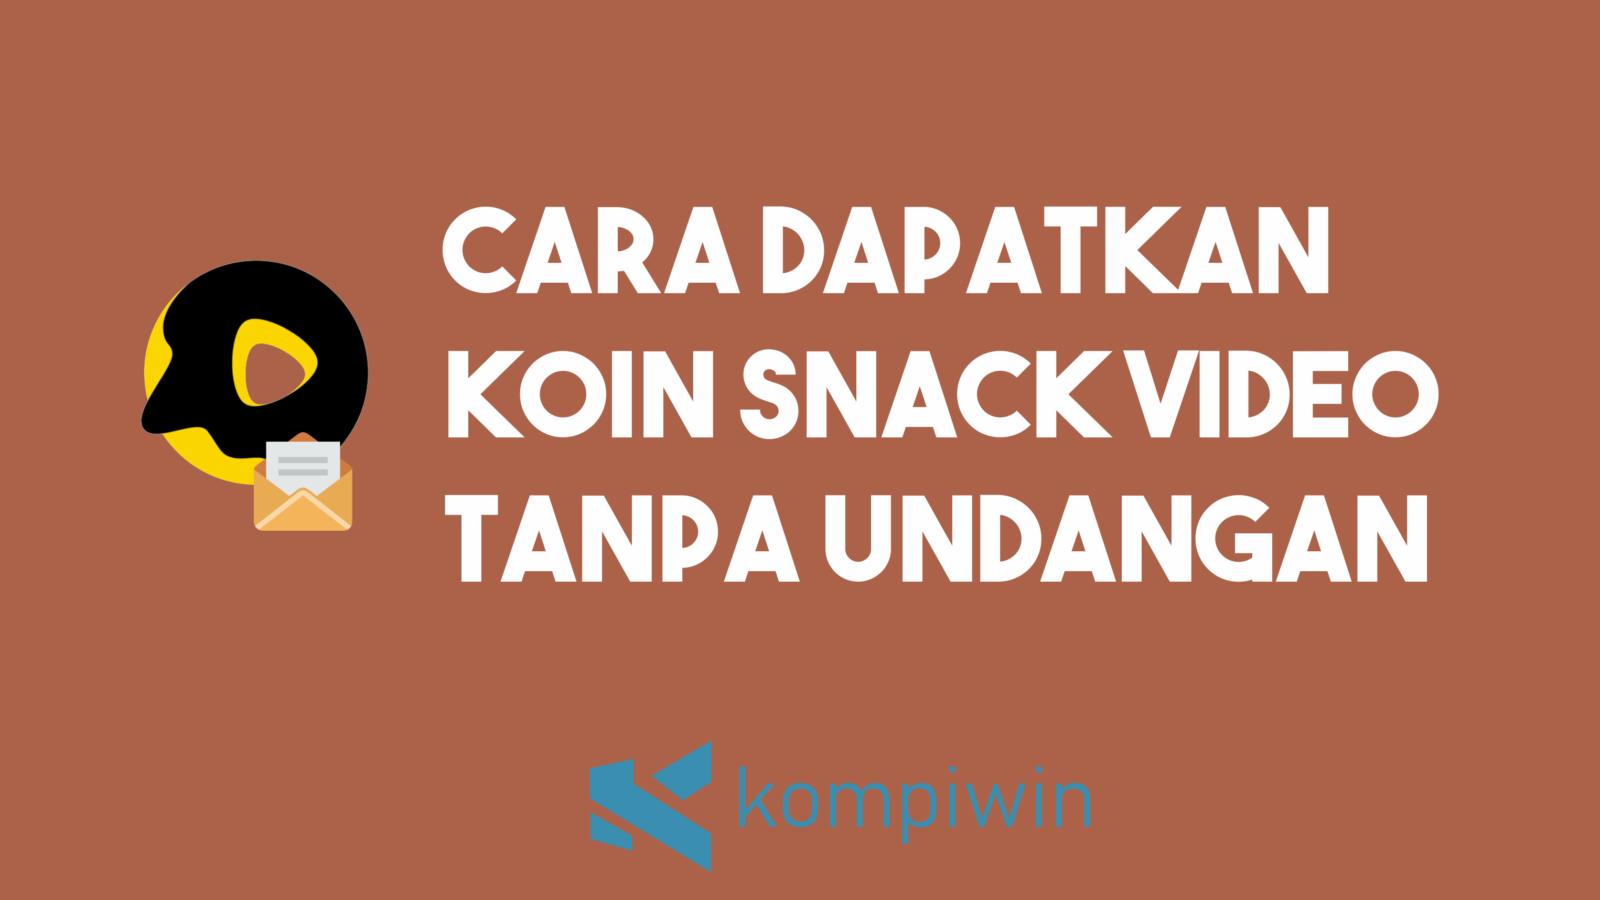 Cara Dapatkan Koin Snack Video Tanpa Undang Teman 4